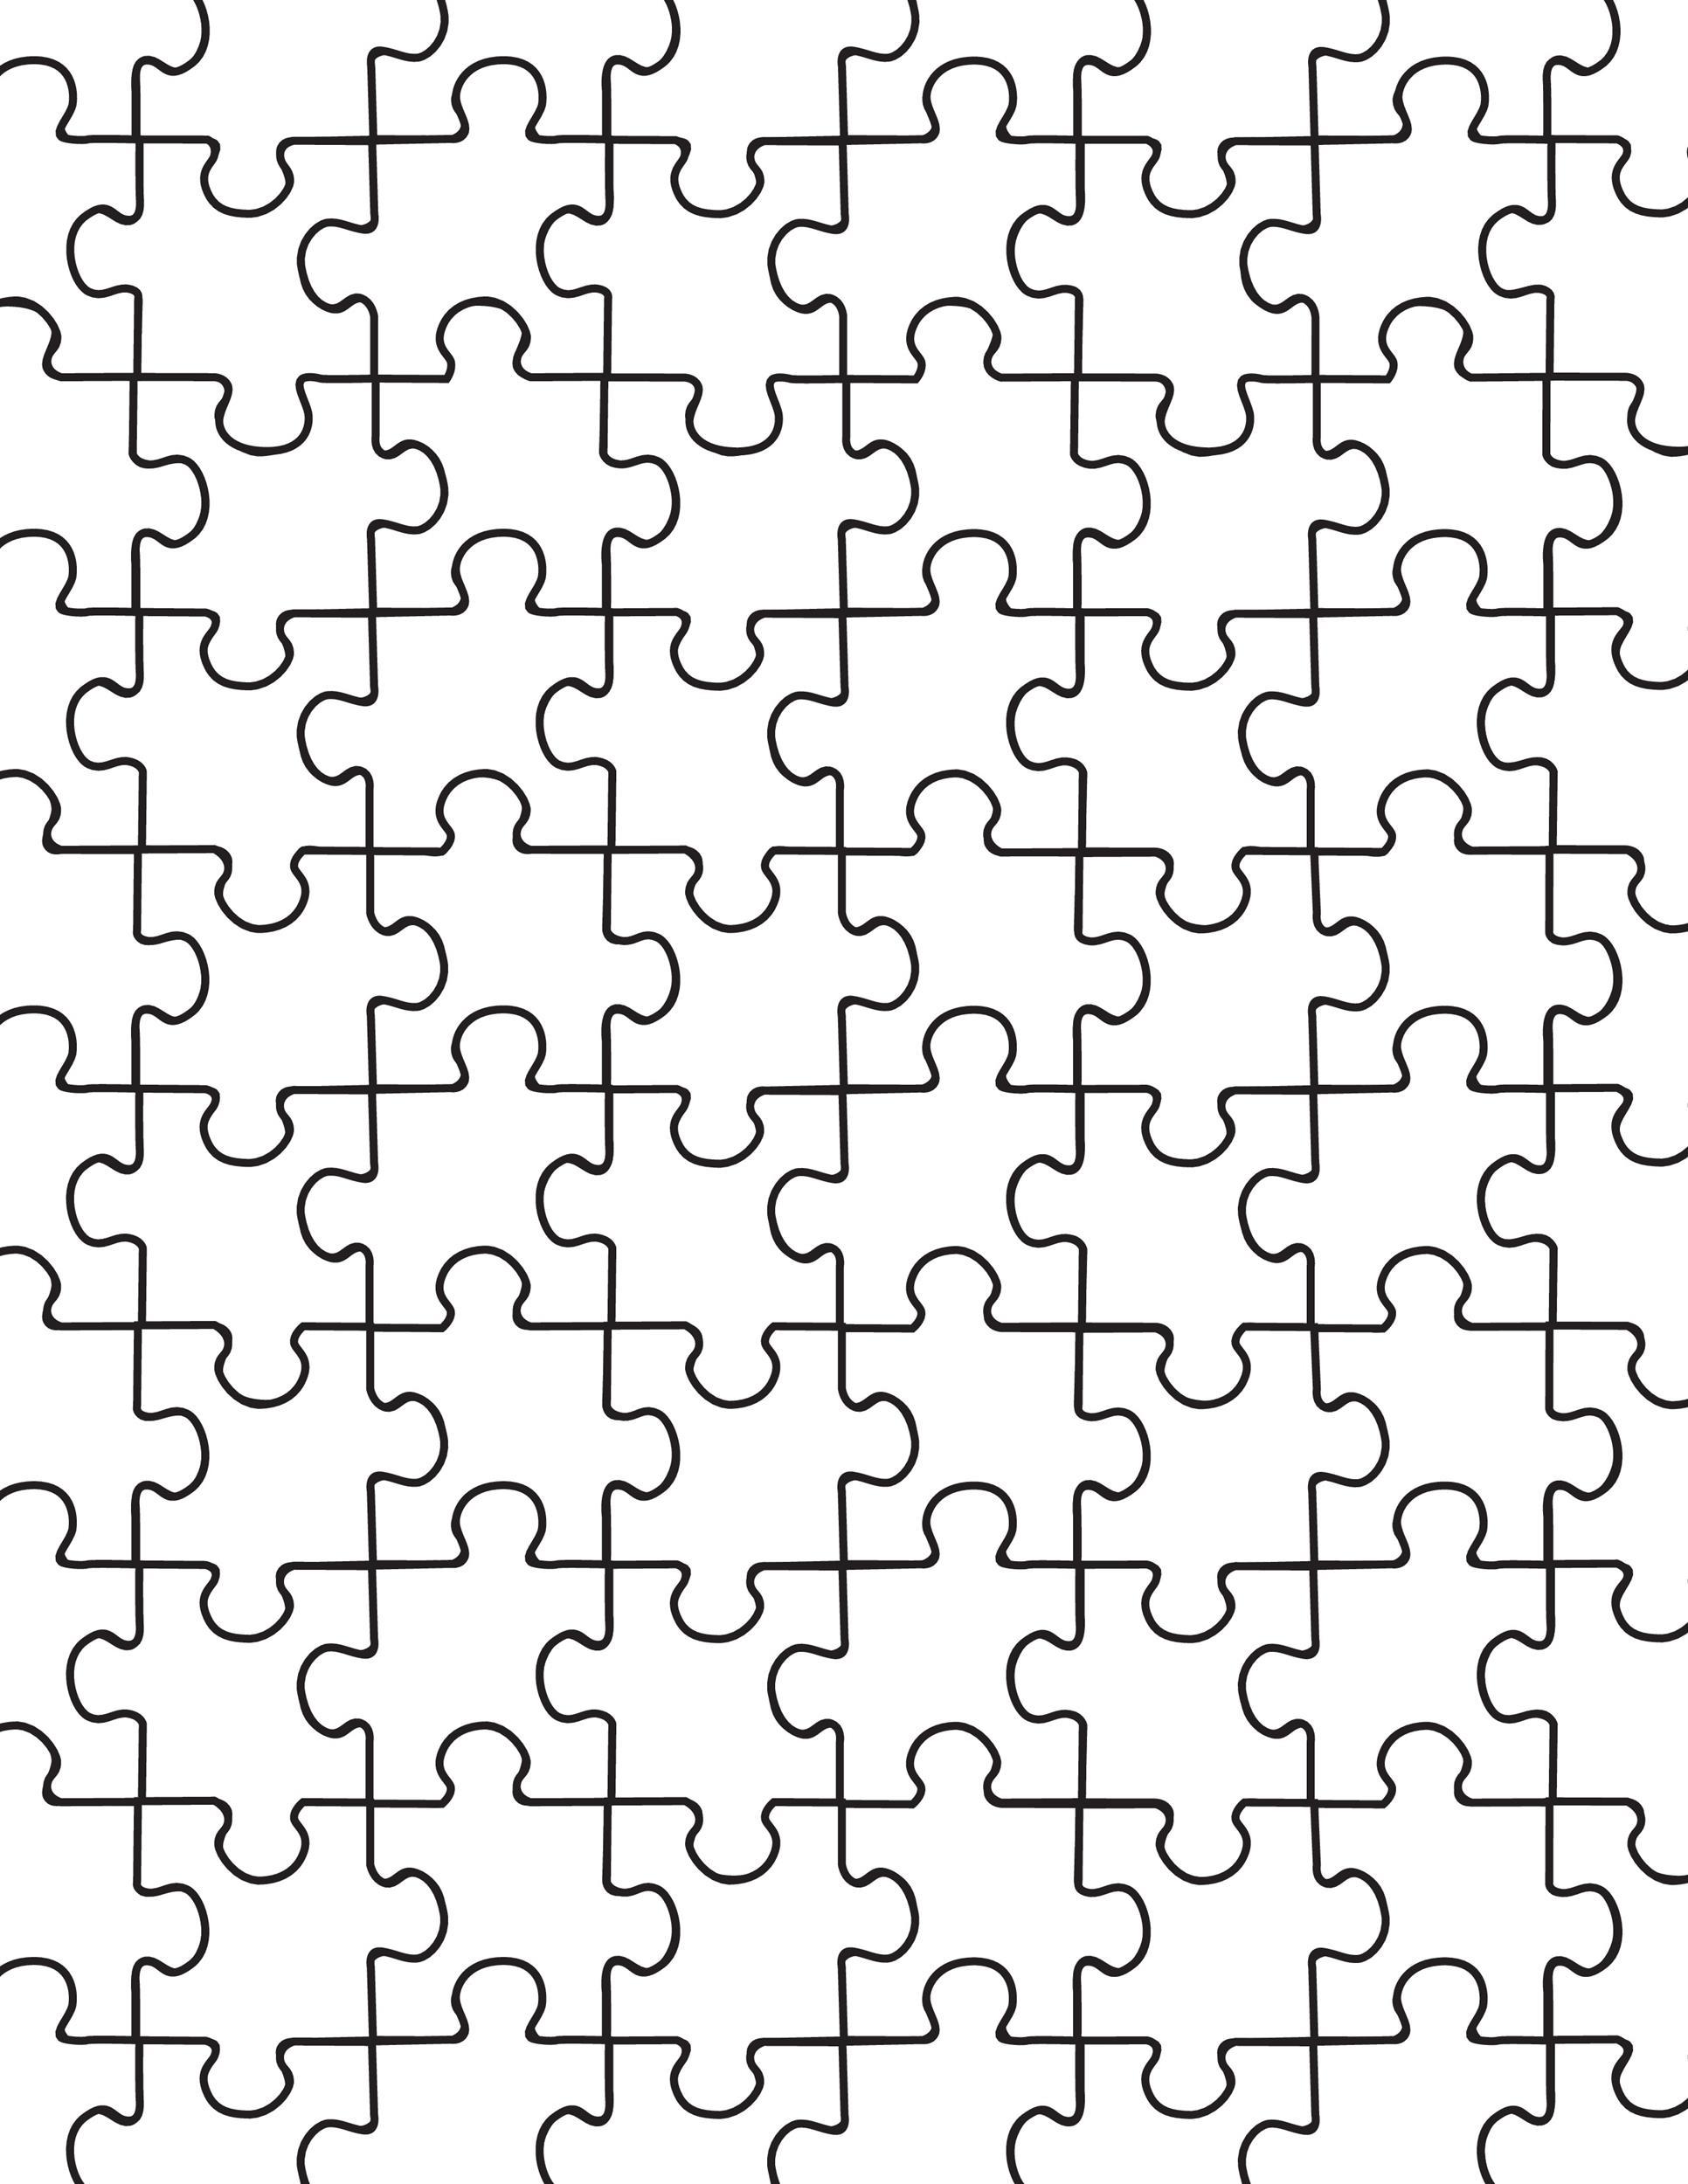 19 Printable Puzzle Piece Templates Templatelab